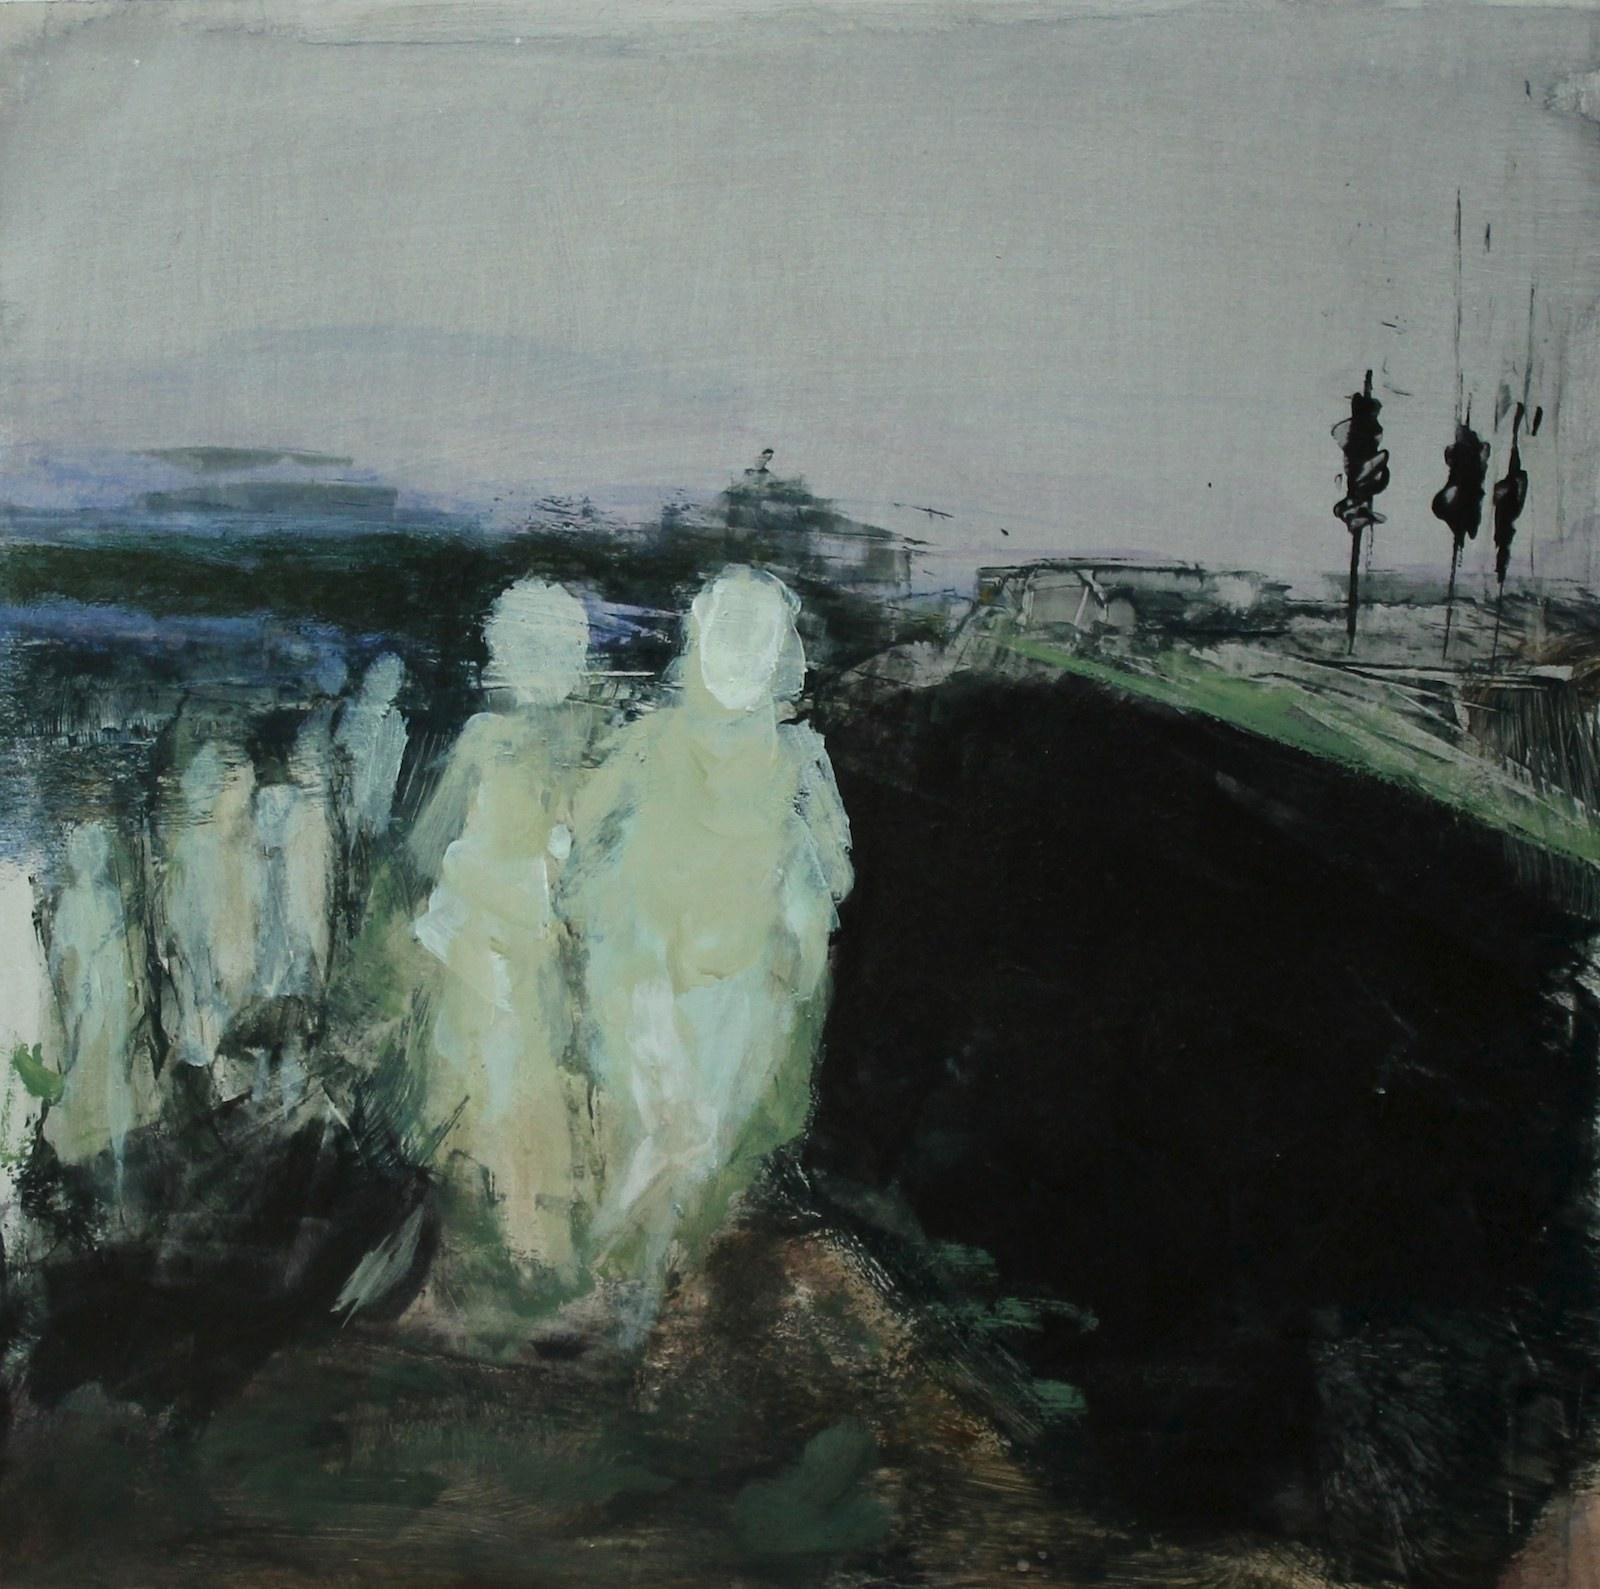 Black river 40 cm x 40 cm, acrylic on mdf, 2019